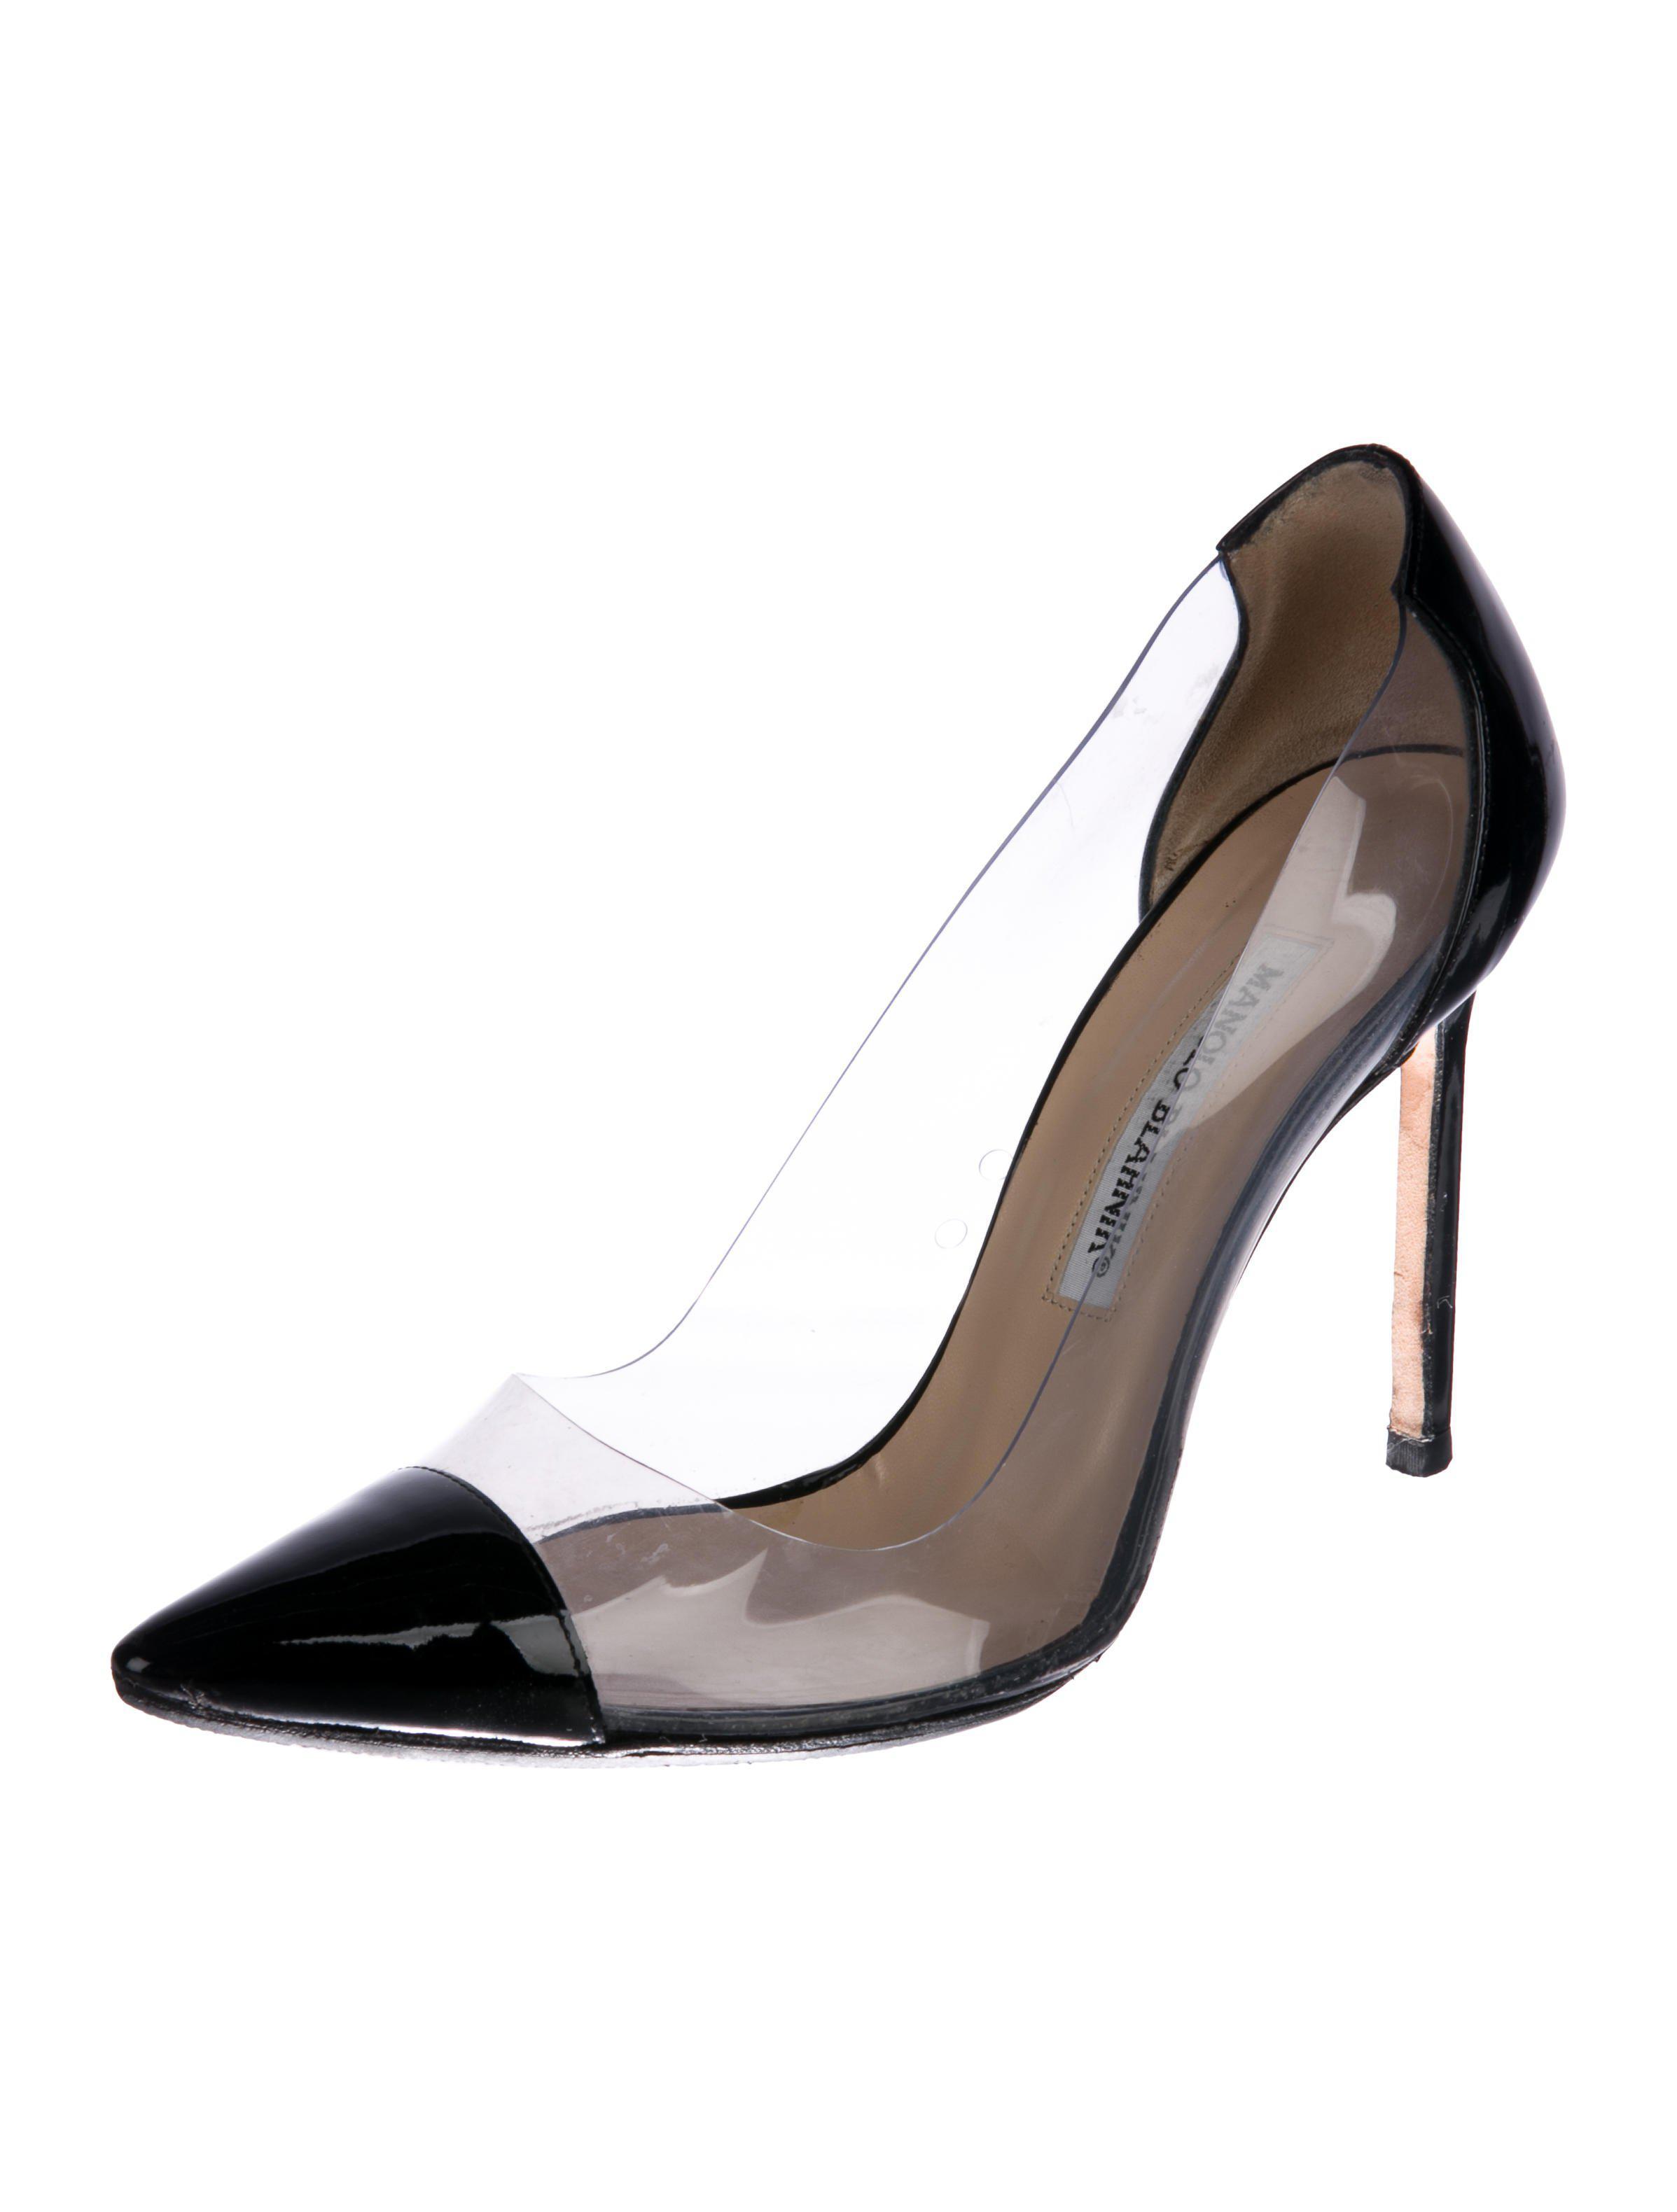 97a2e47a0d24 lyst manolo blahnik pvc cap toe pumps clear in white rh lyst com